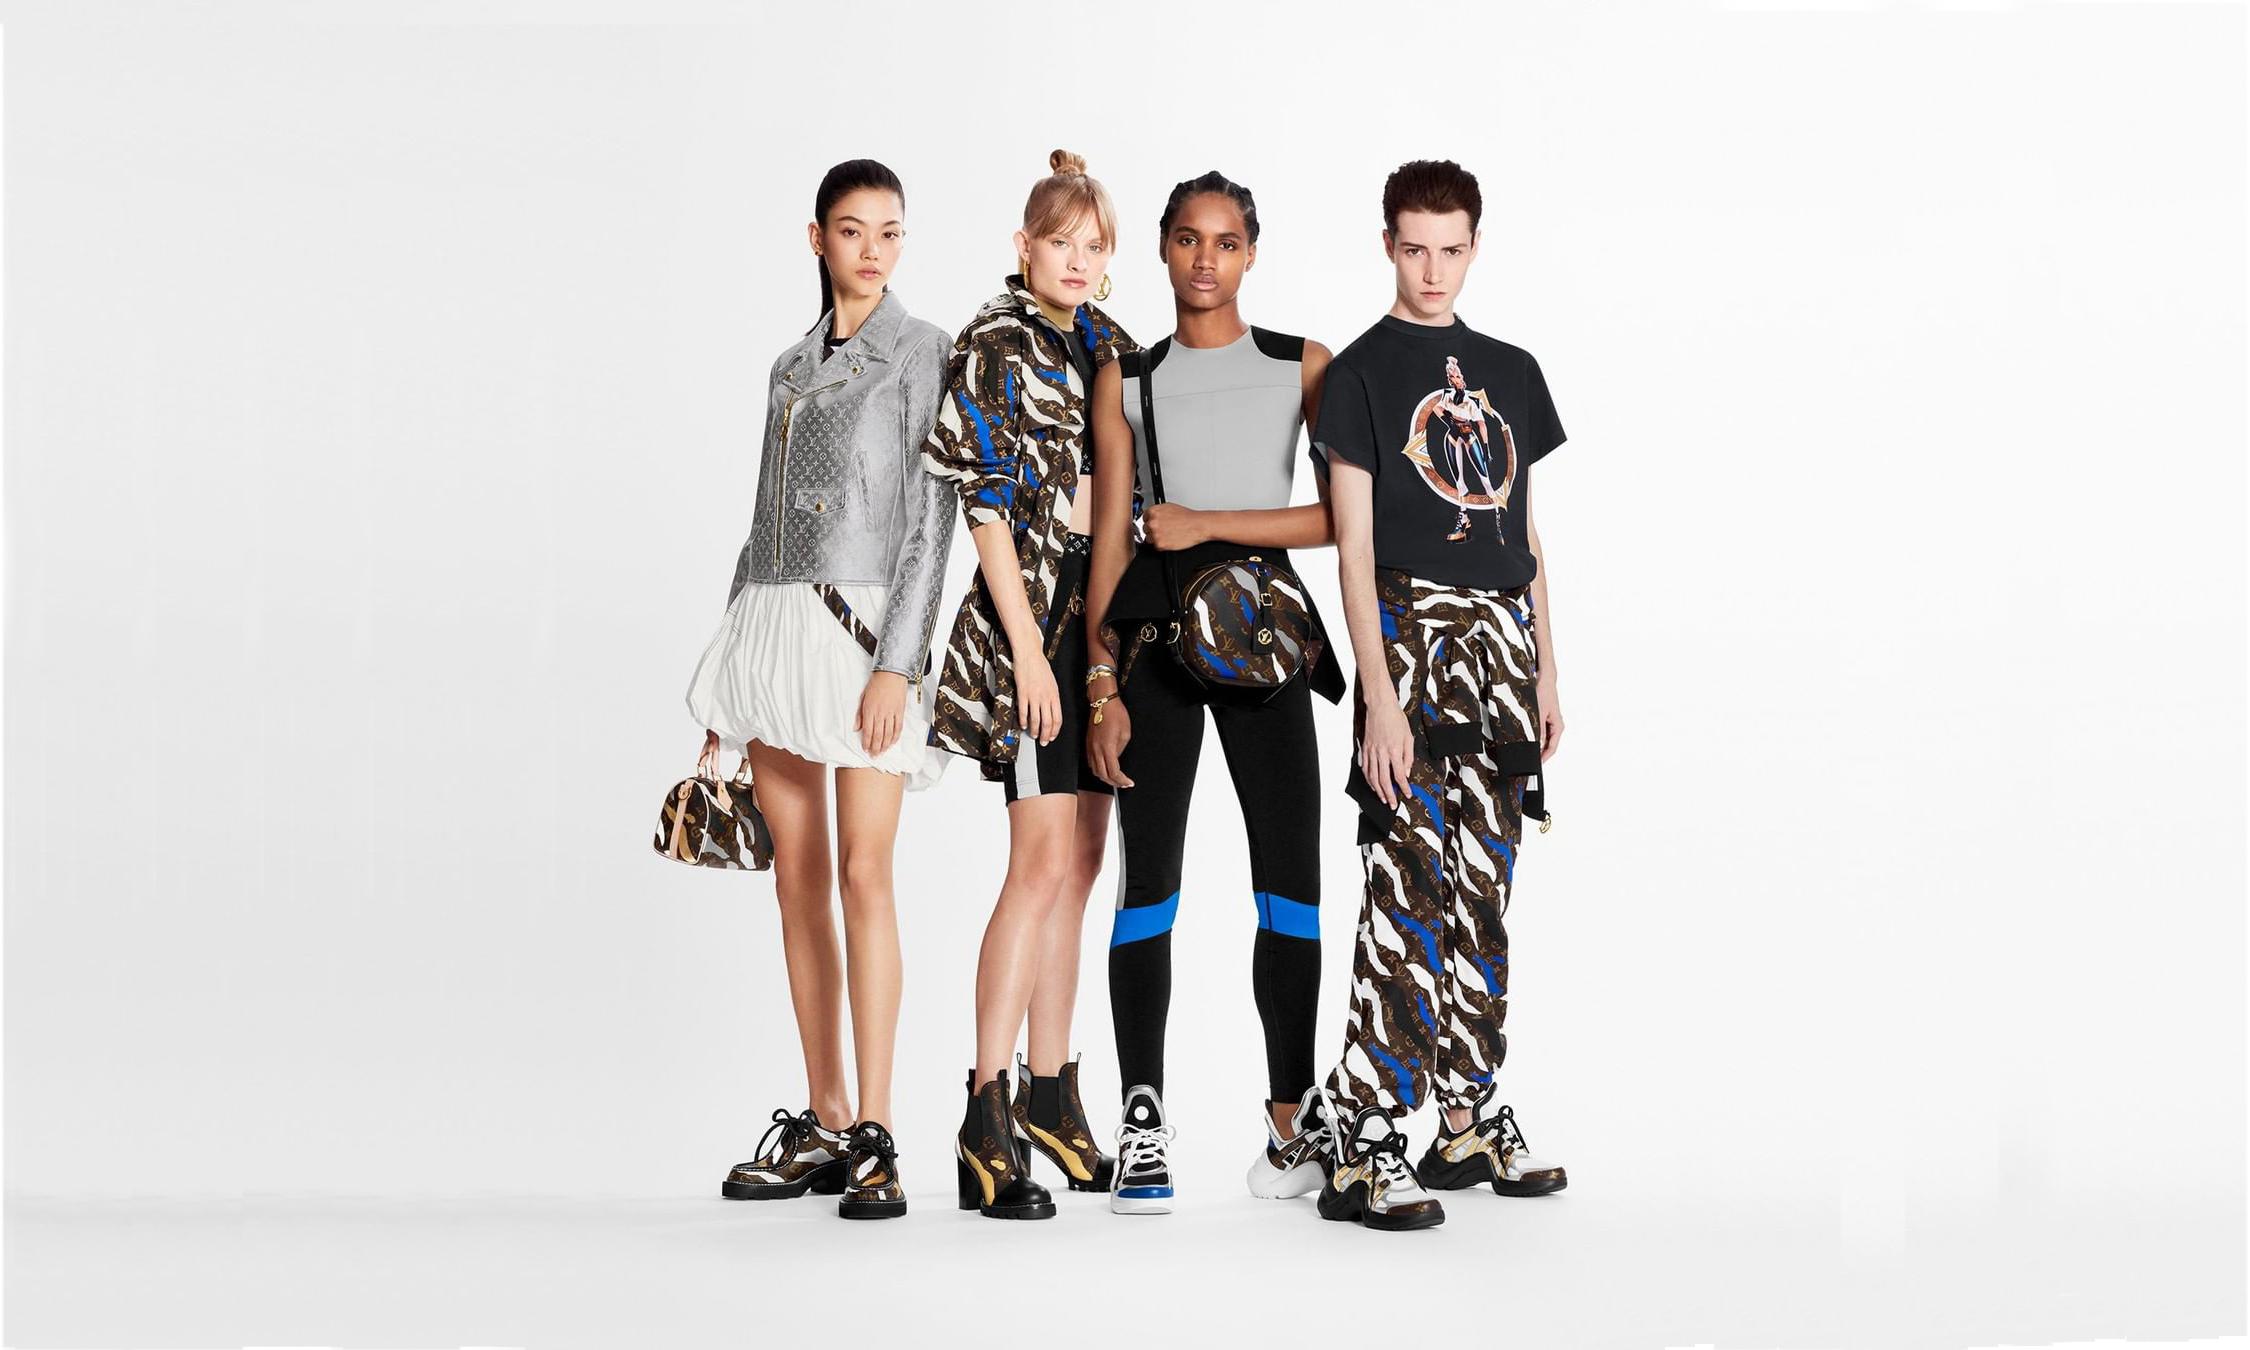 Louis Vuitton 发布《英雄联盟》主题系列 Lookbook